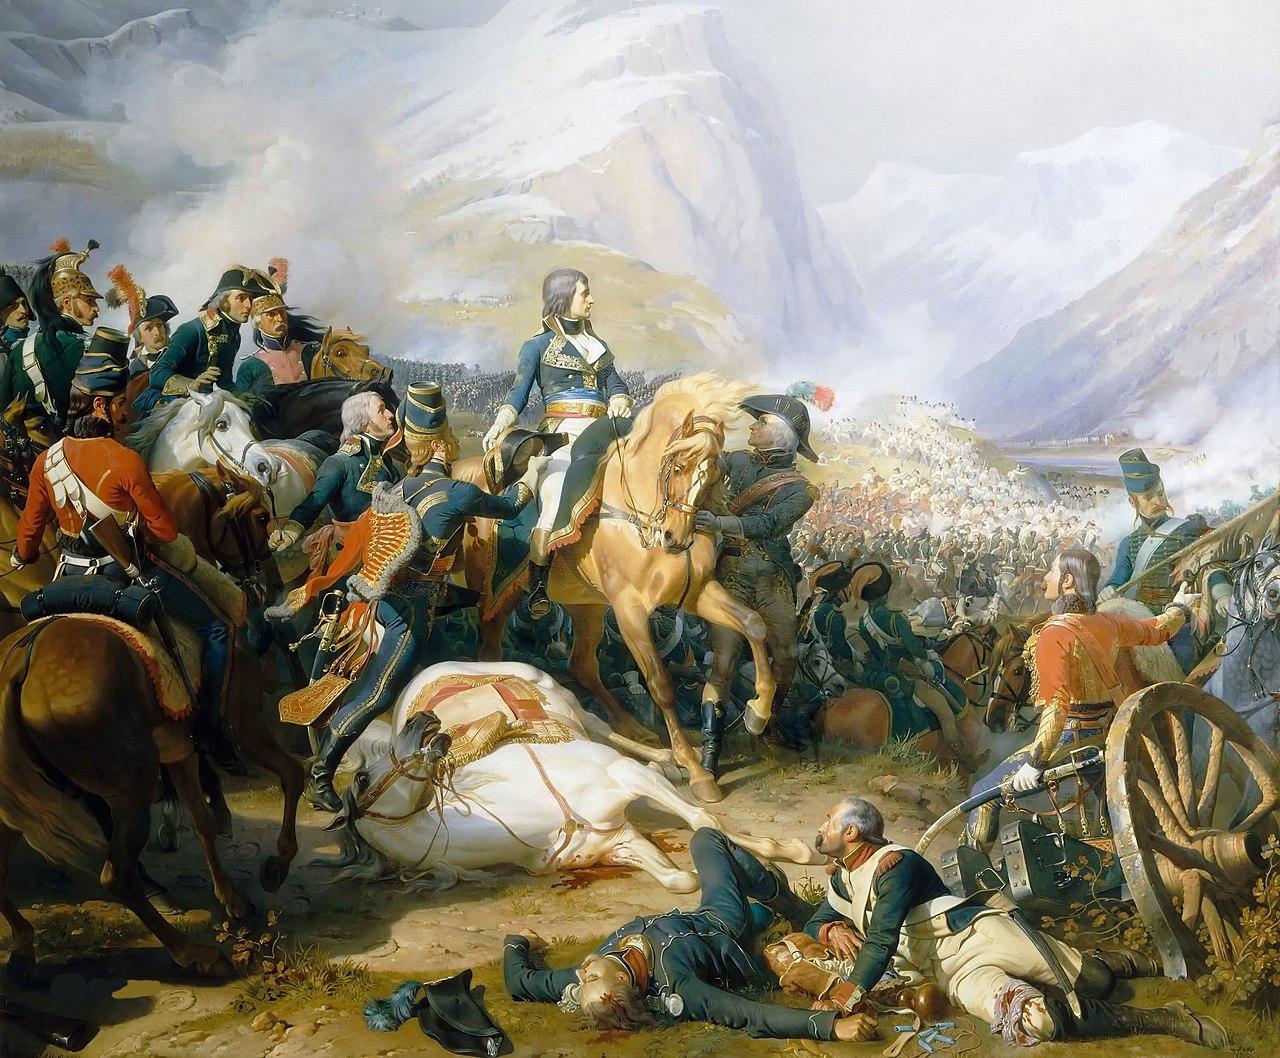 Филиппото, Феликс-Эмманюэль-Анри -Наполеон в битве при Риволи.jpg